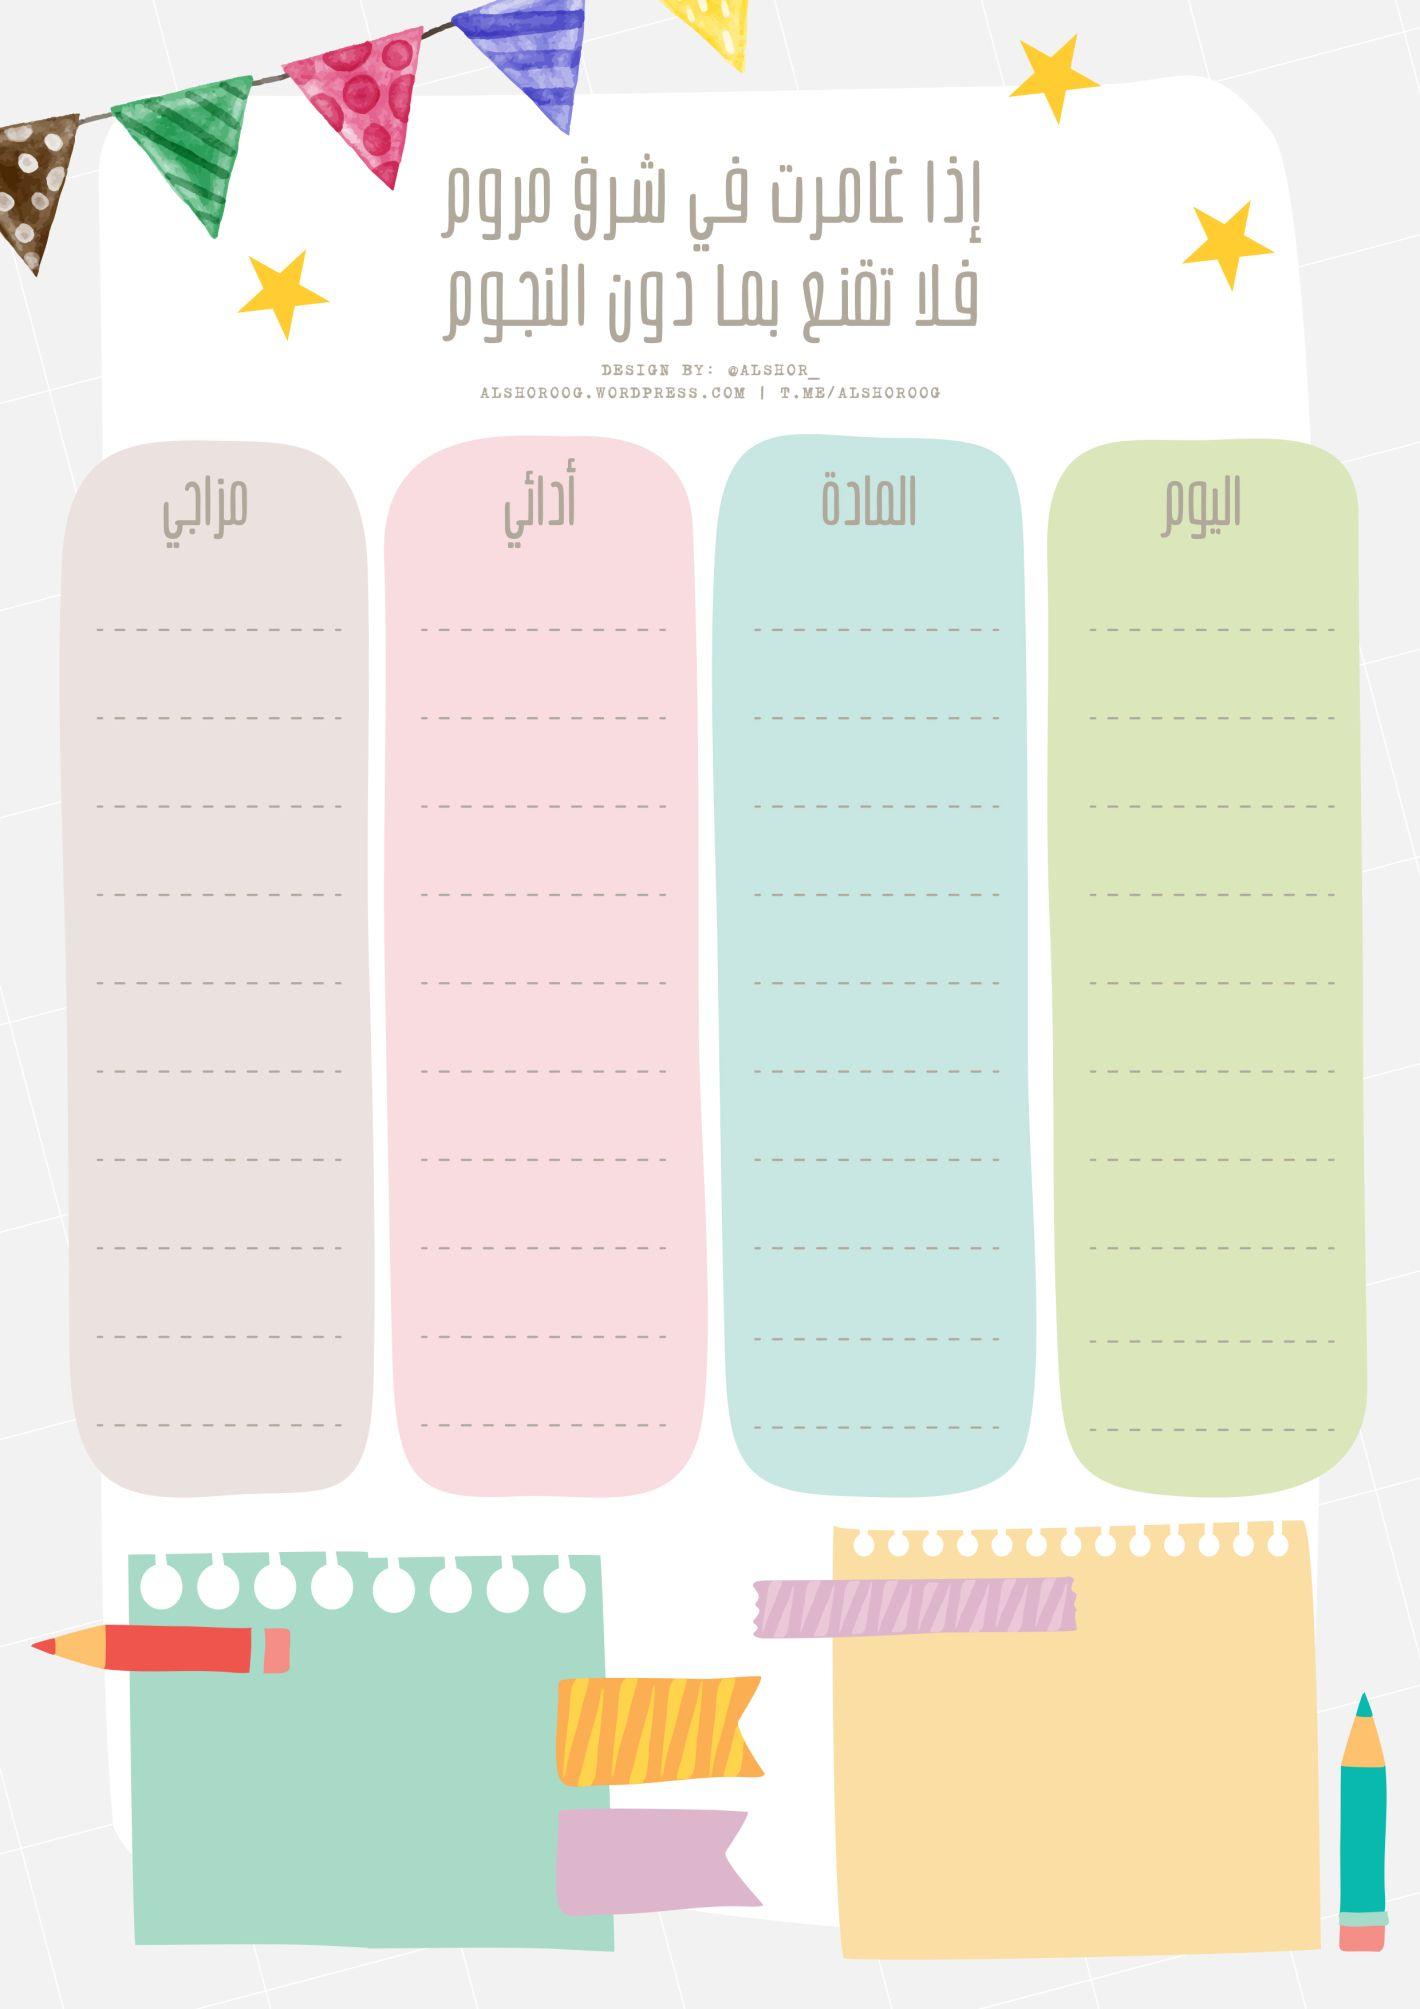 جدول اختبارات بعبارة م حف زة Pie Chart Chart Diagram